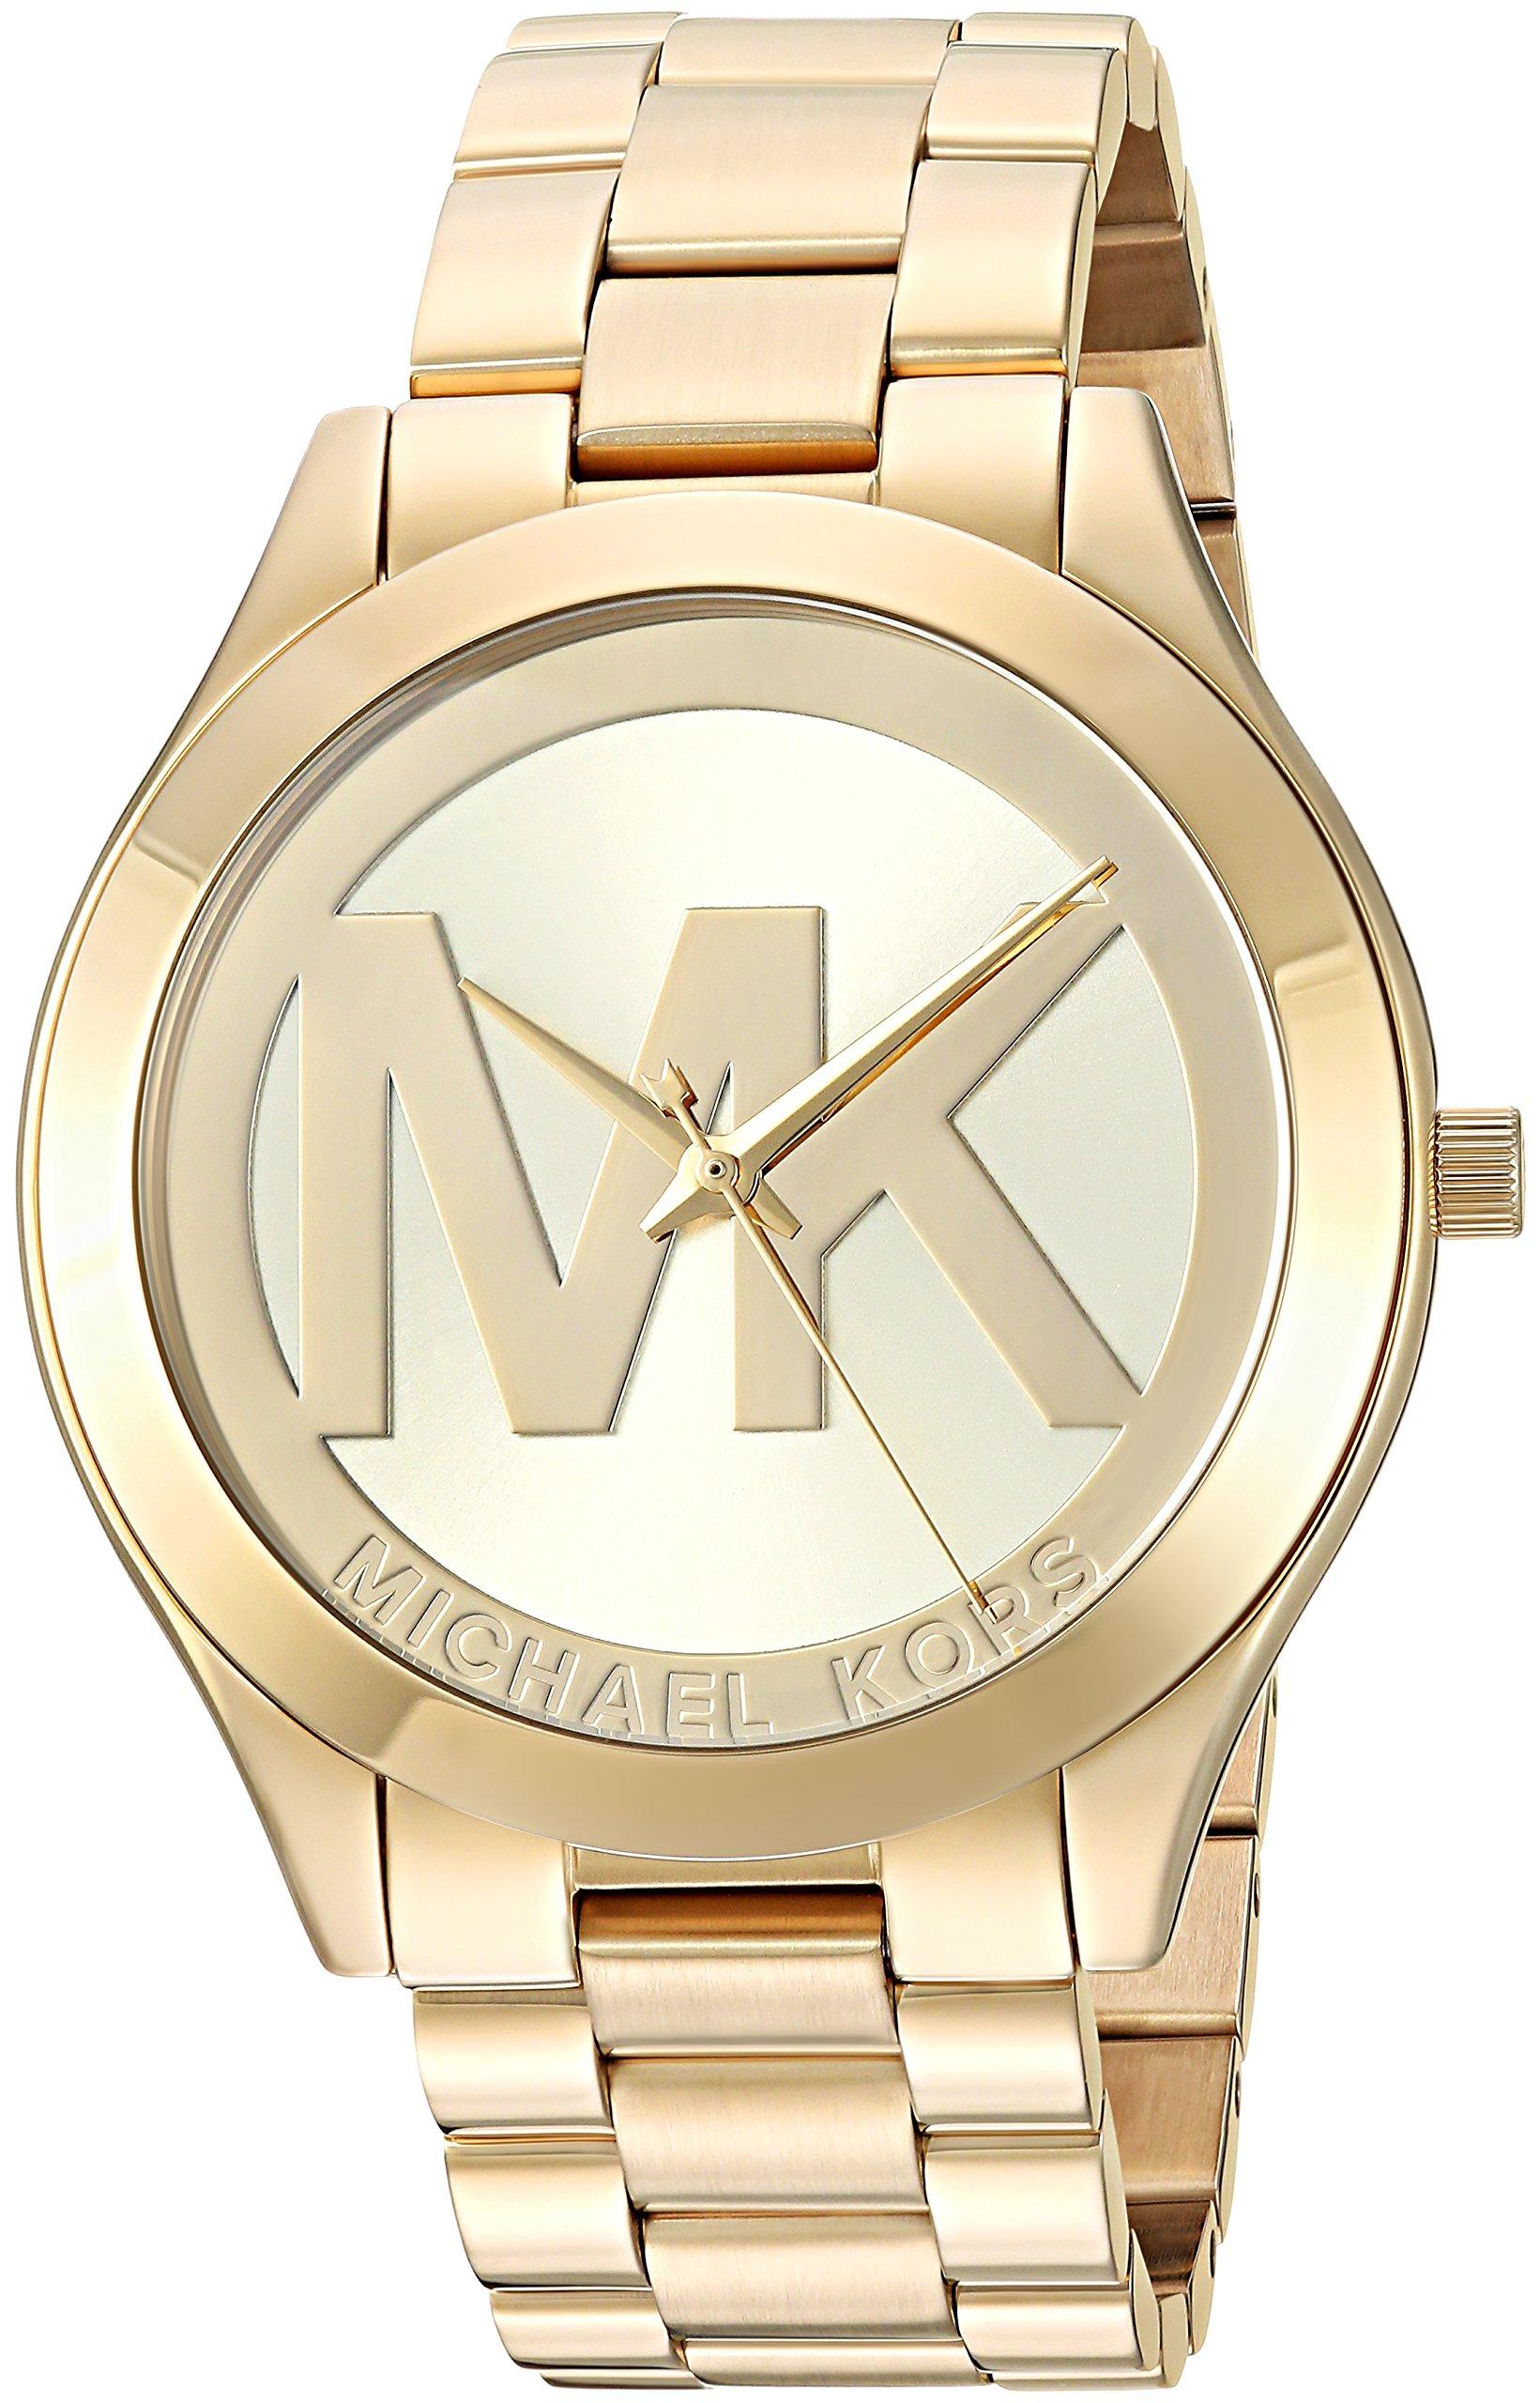 Michael Kors Women's 'Slim Runway' Quartz Stainless Steel Casual Watch, Color:Gold-Toned (Model: MK3739)